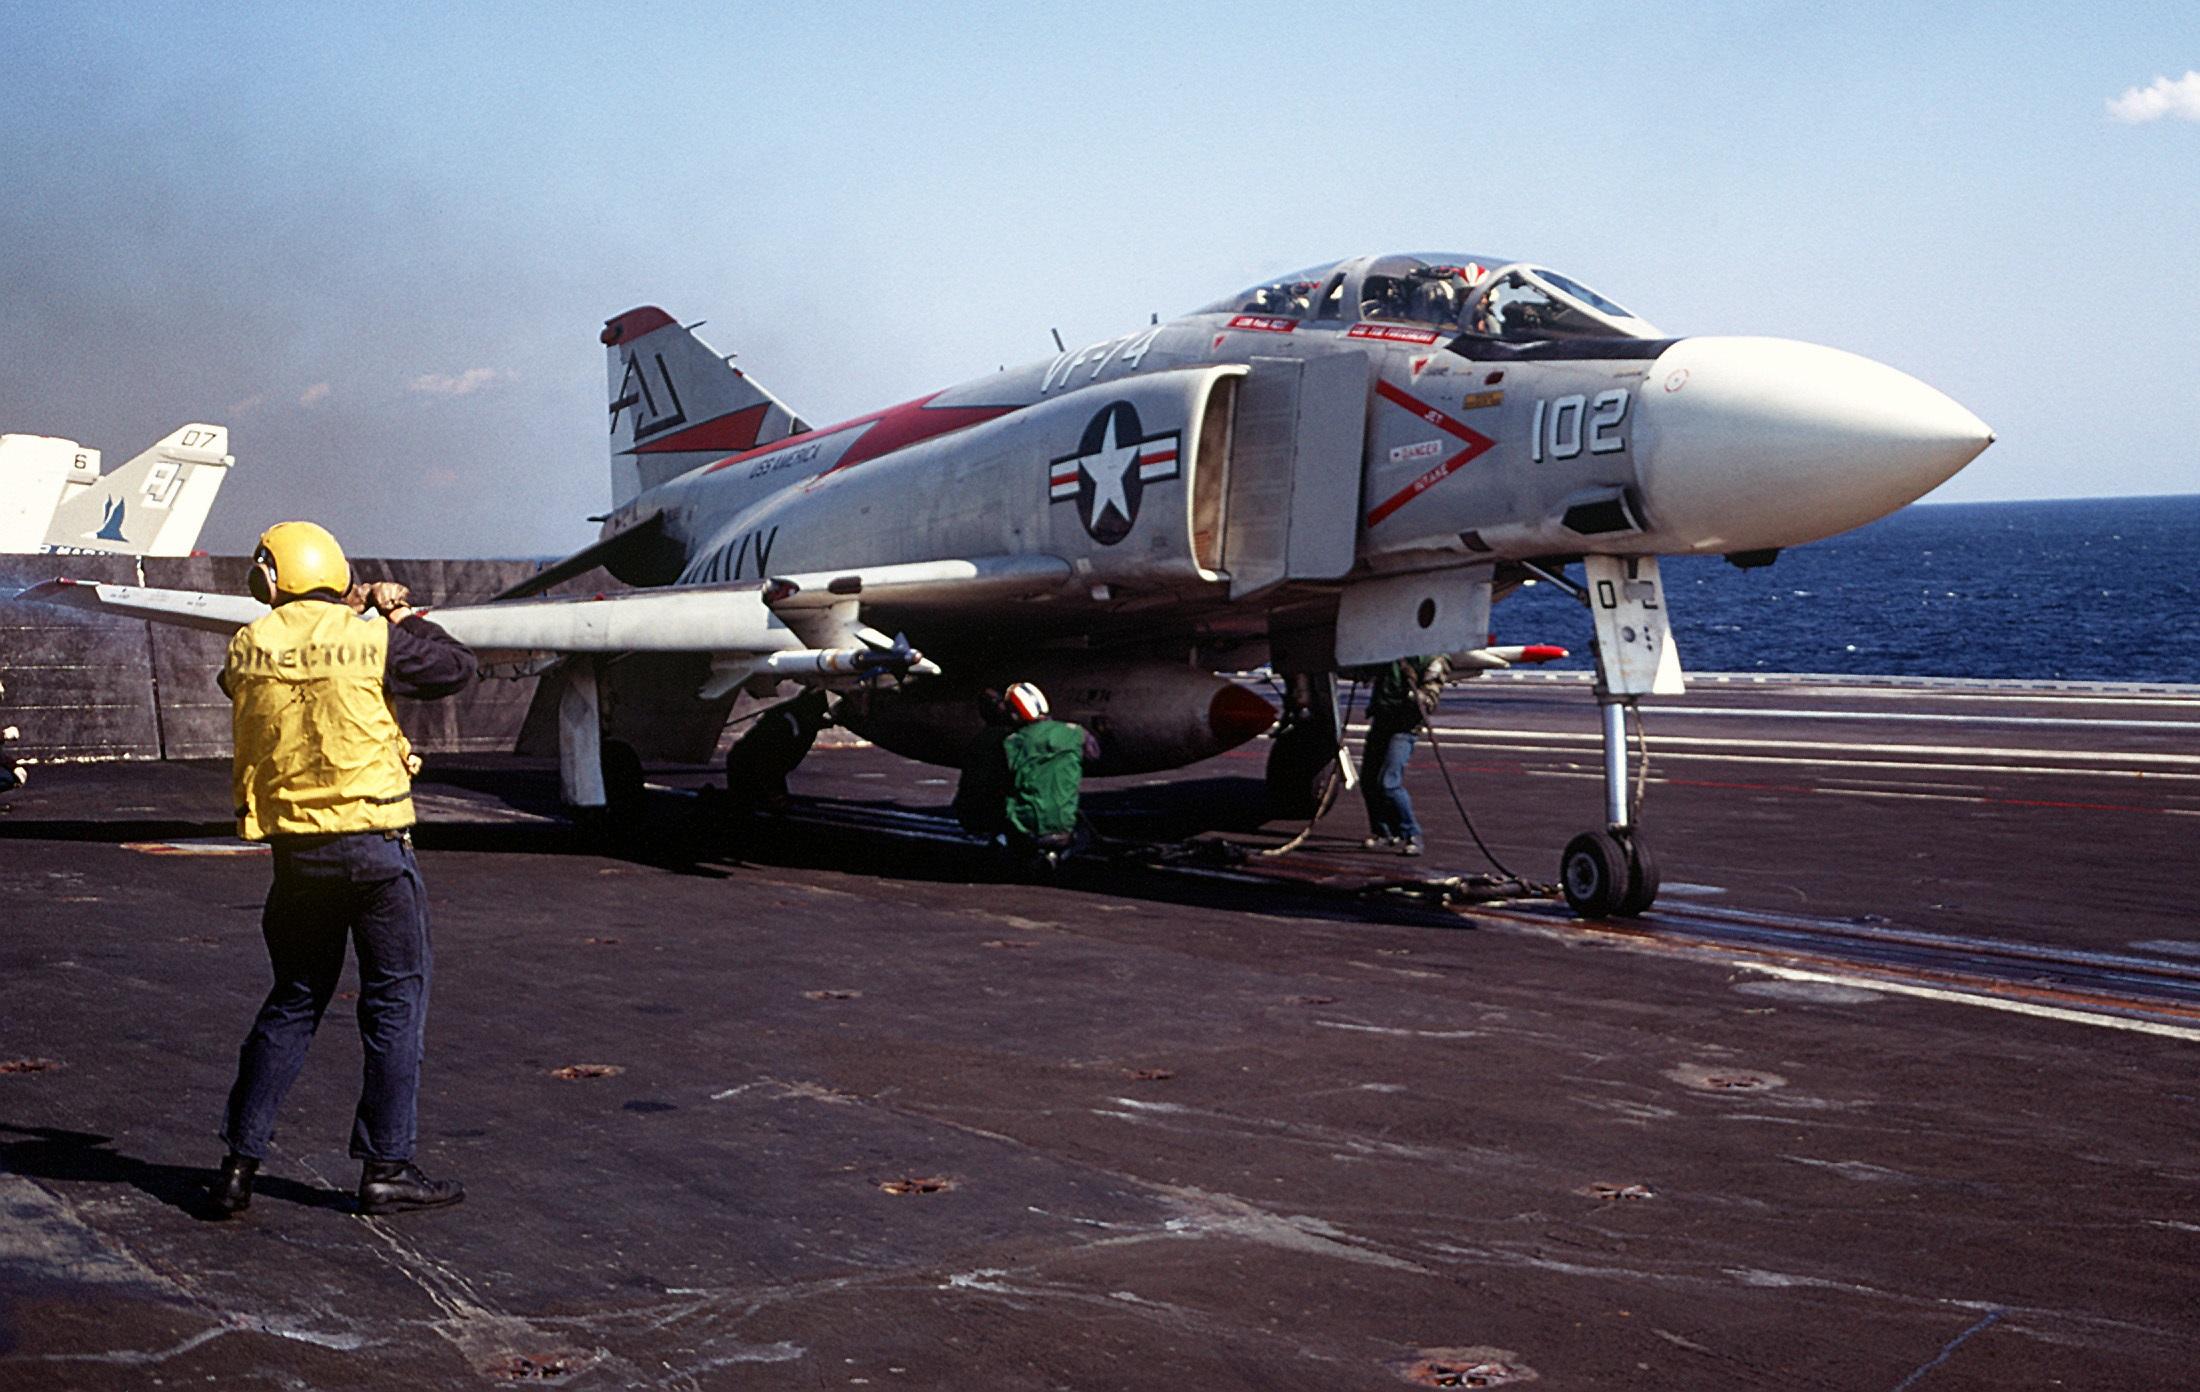 That Time Gaddafi Scrambled 70 Fighter Jets to Intercept U.S. Navy